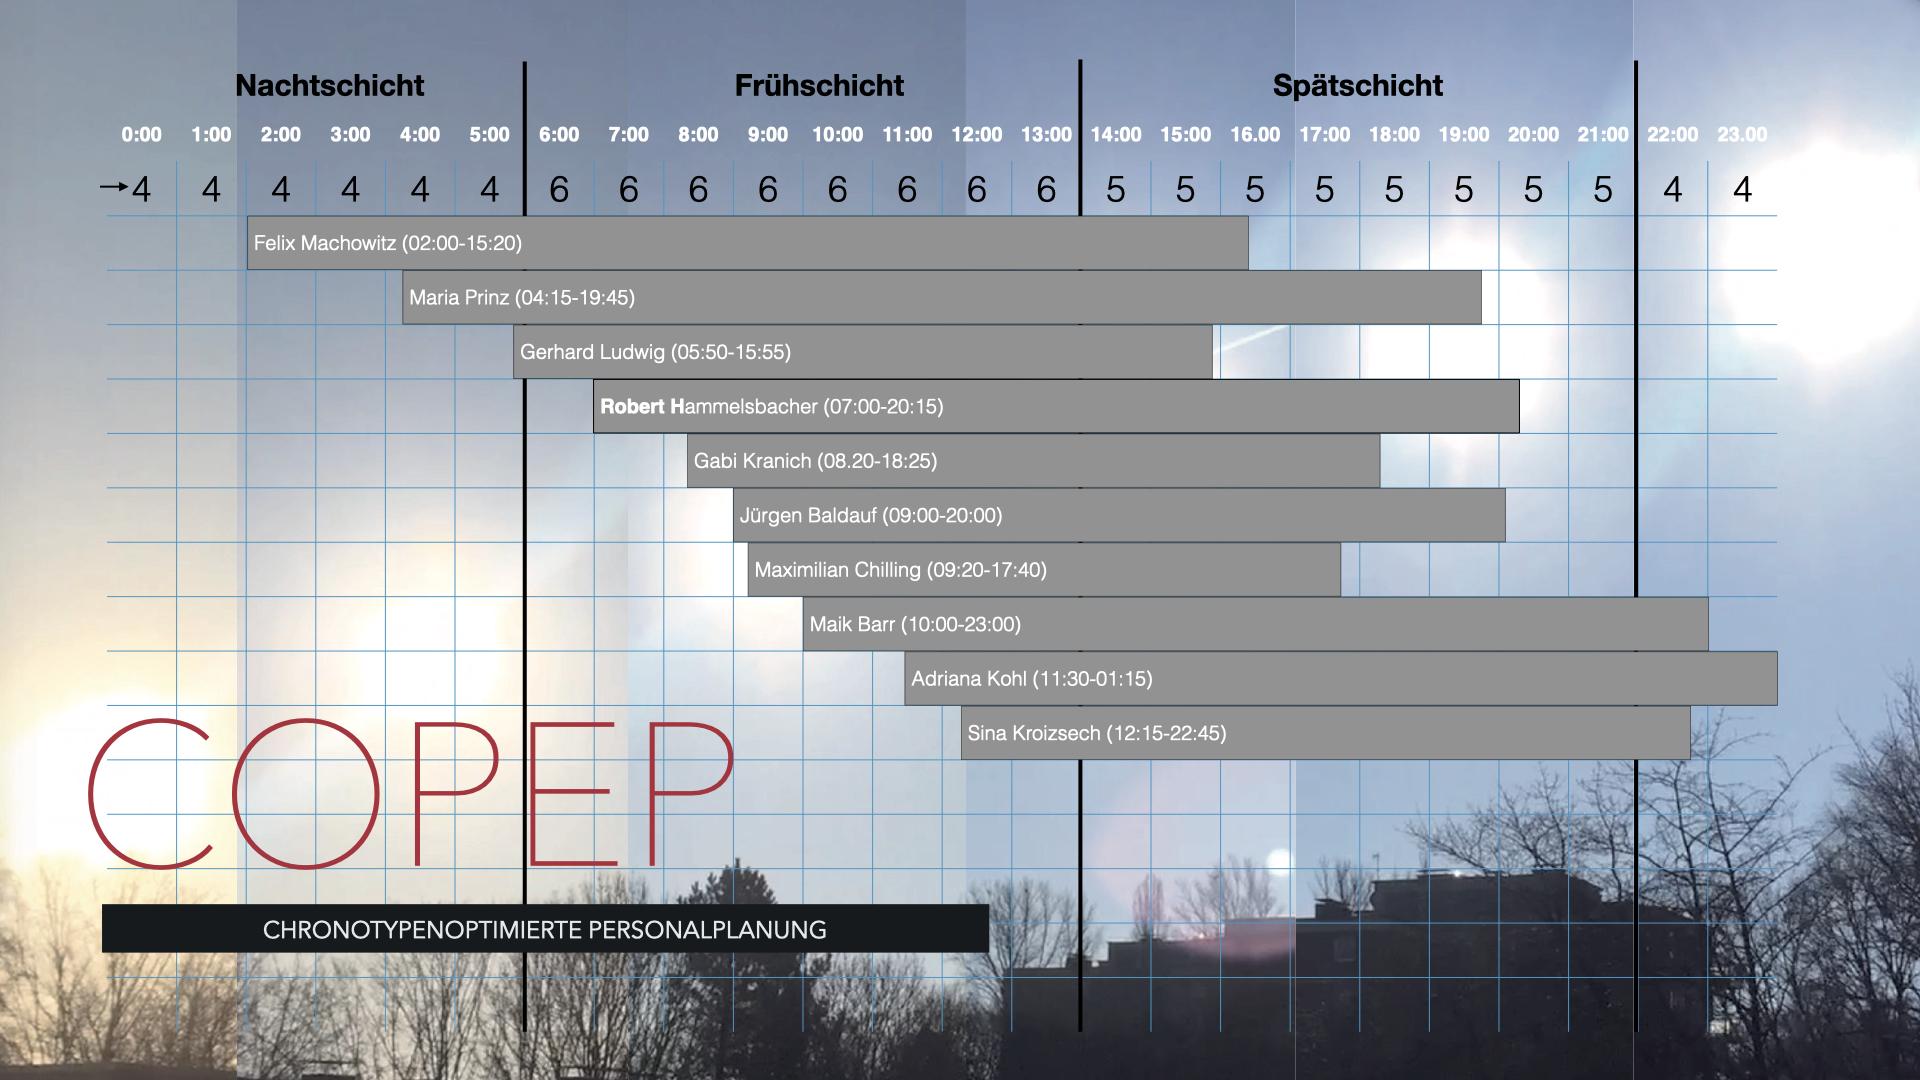 COPEP Chronotypenoptimierte Personaleinsatzplanung